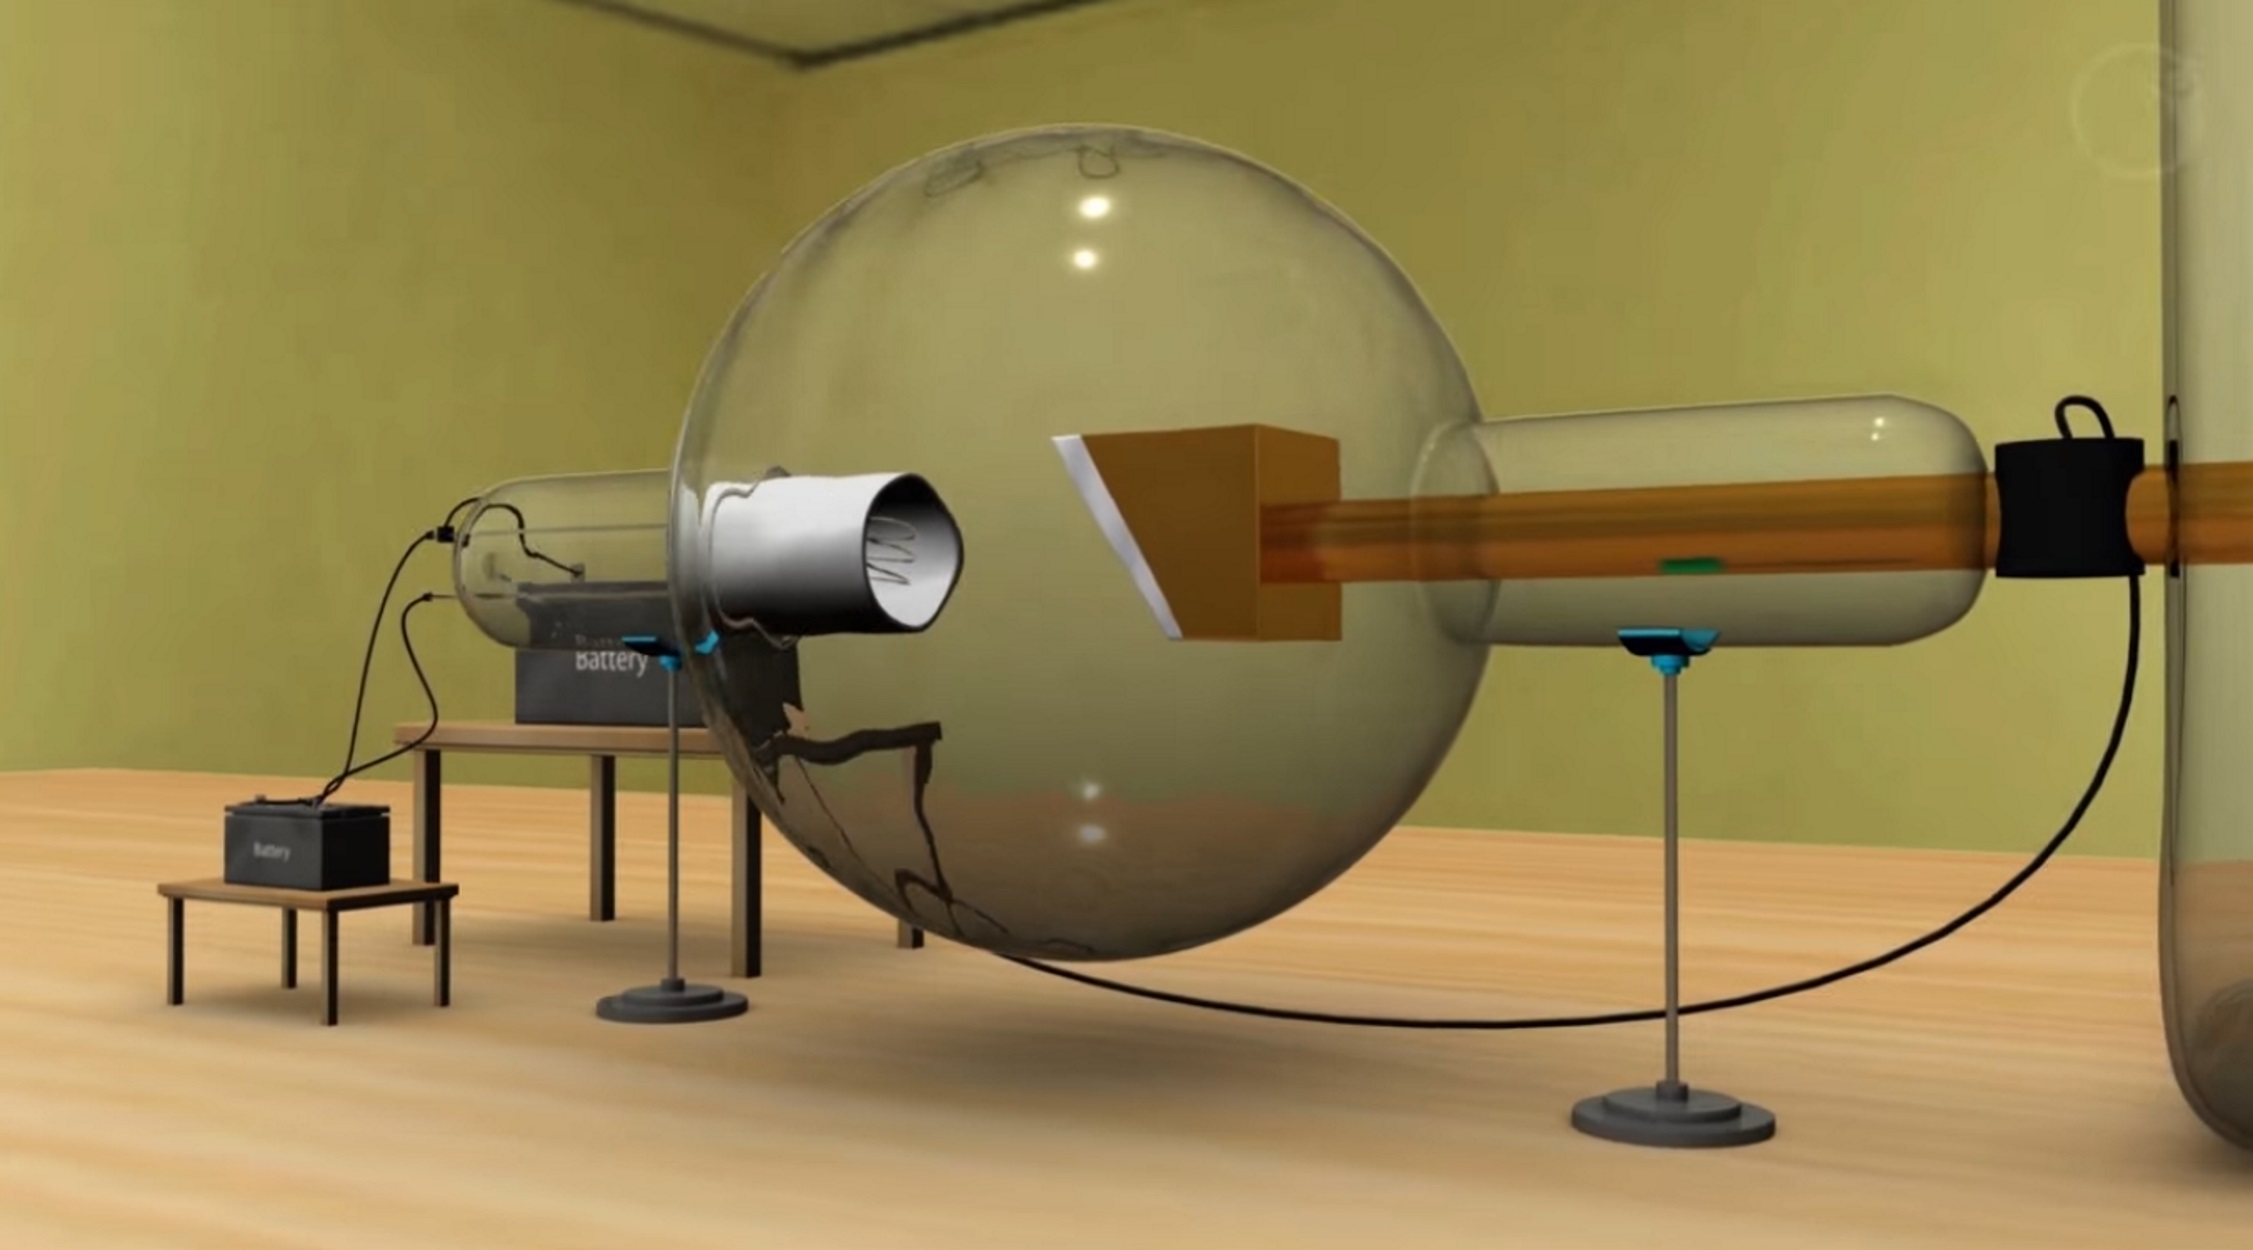 Goggle: Νέο σύστημα τεχνητής νοημοσύνης εξηγεί τις ακτινογραφίες